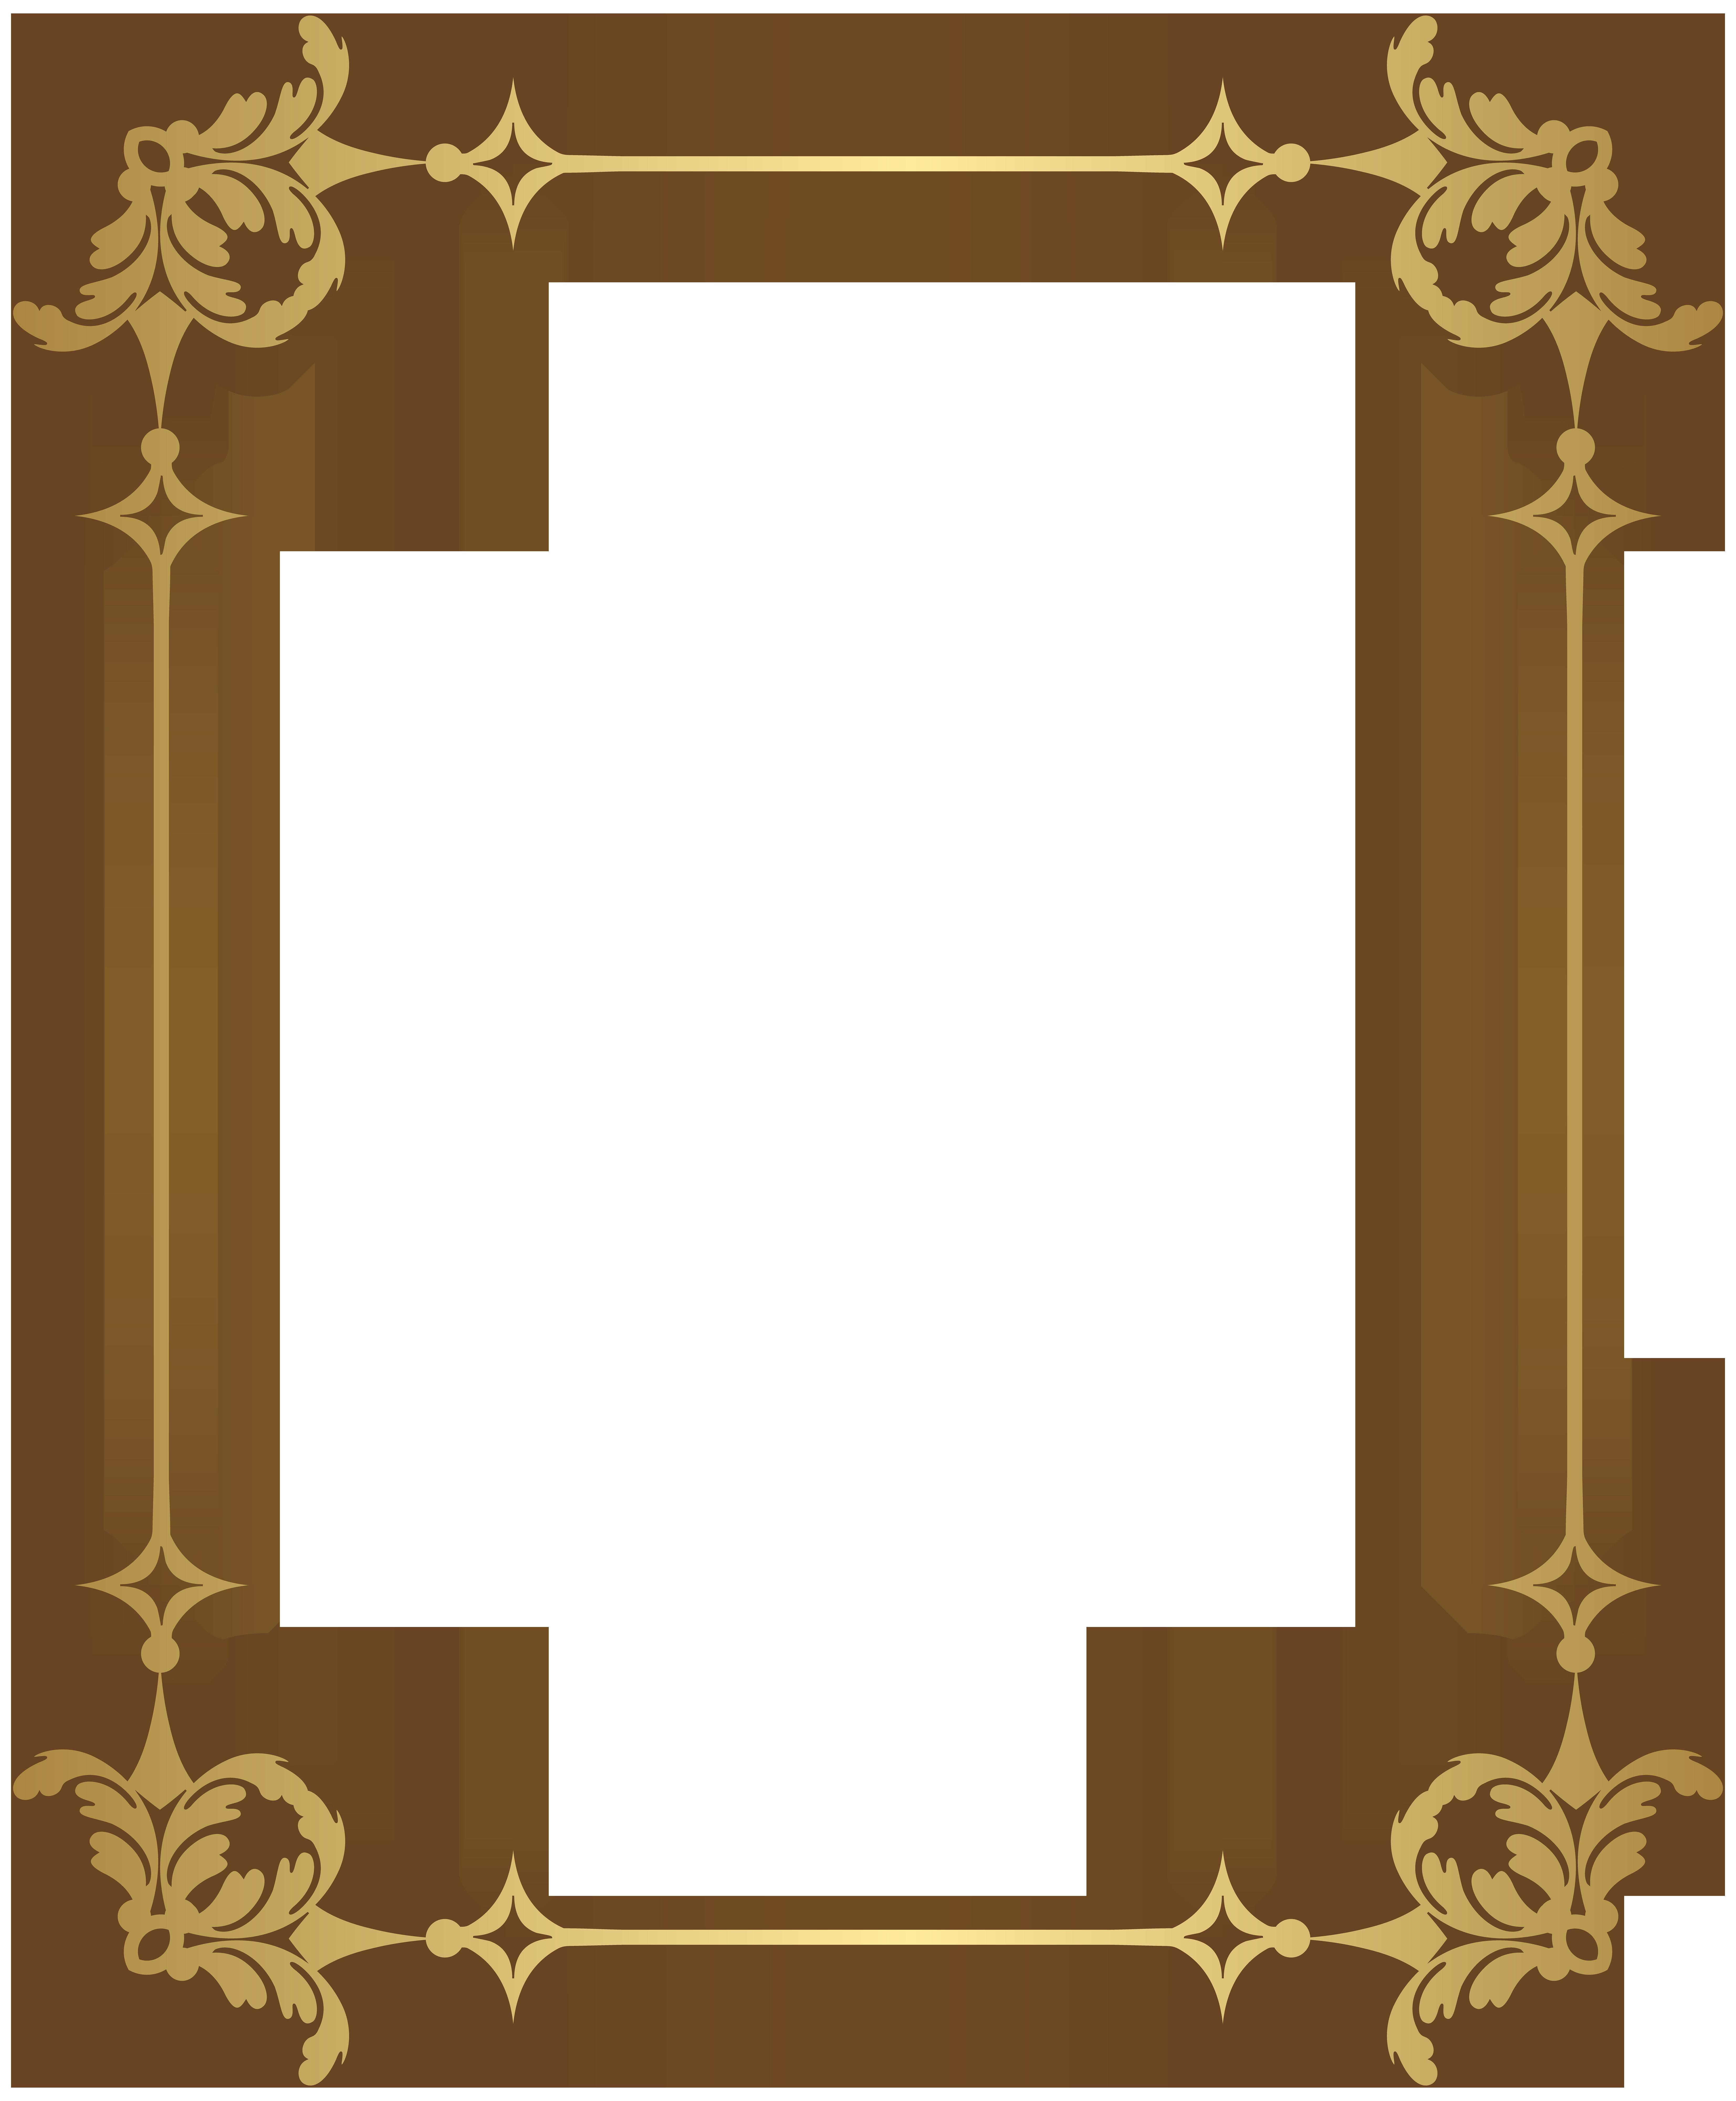 Border decoration transparent clip. Decorative frame png